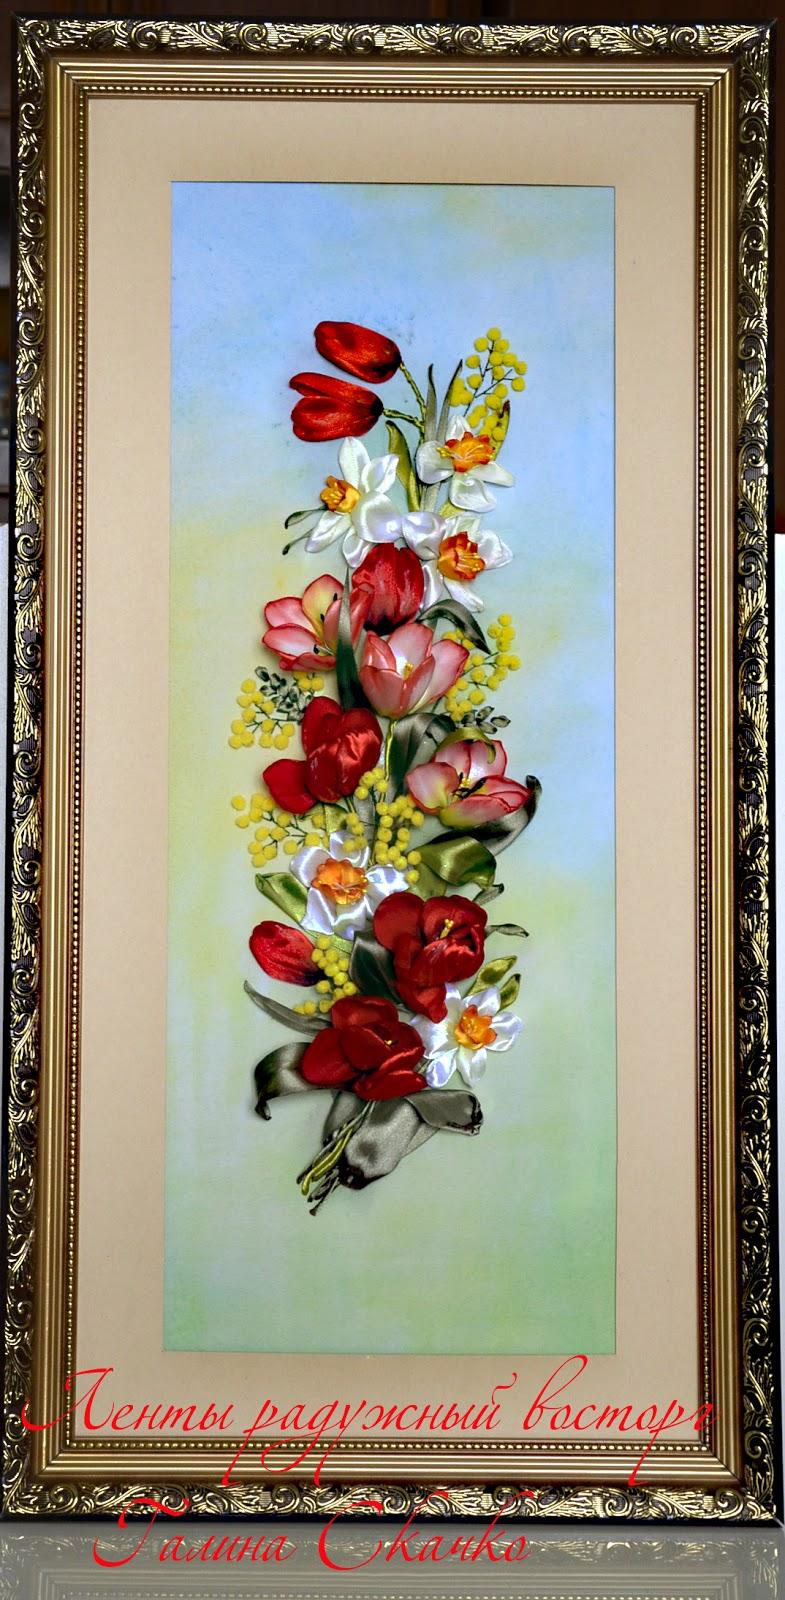 картины вышитые лентами. весенние цветы вышитые лентами